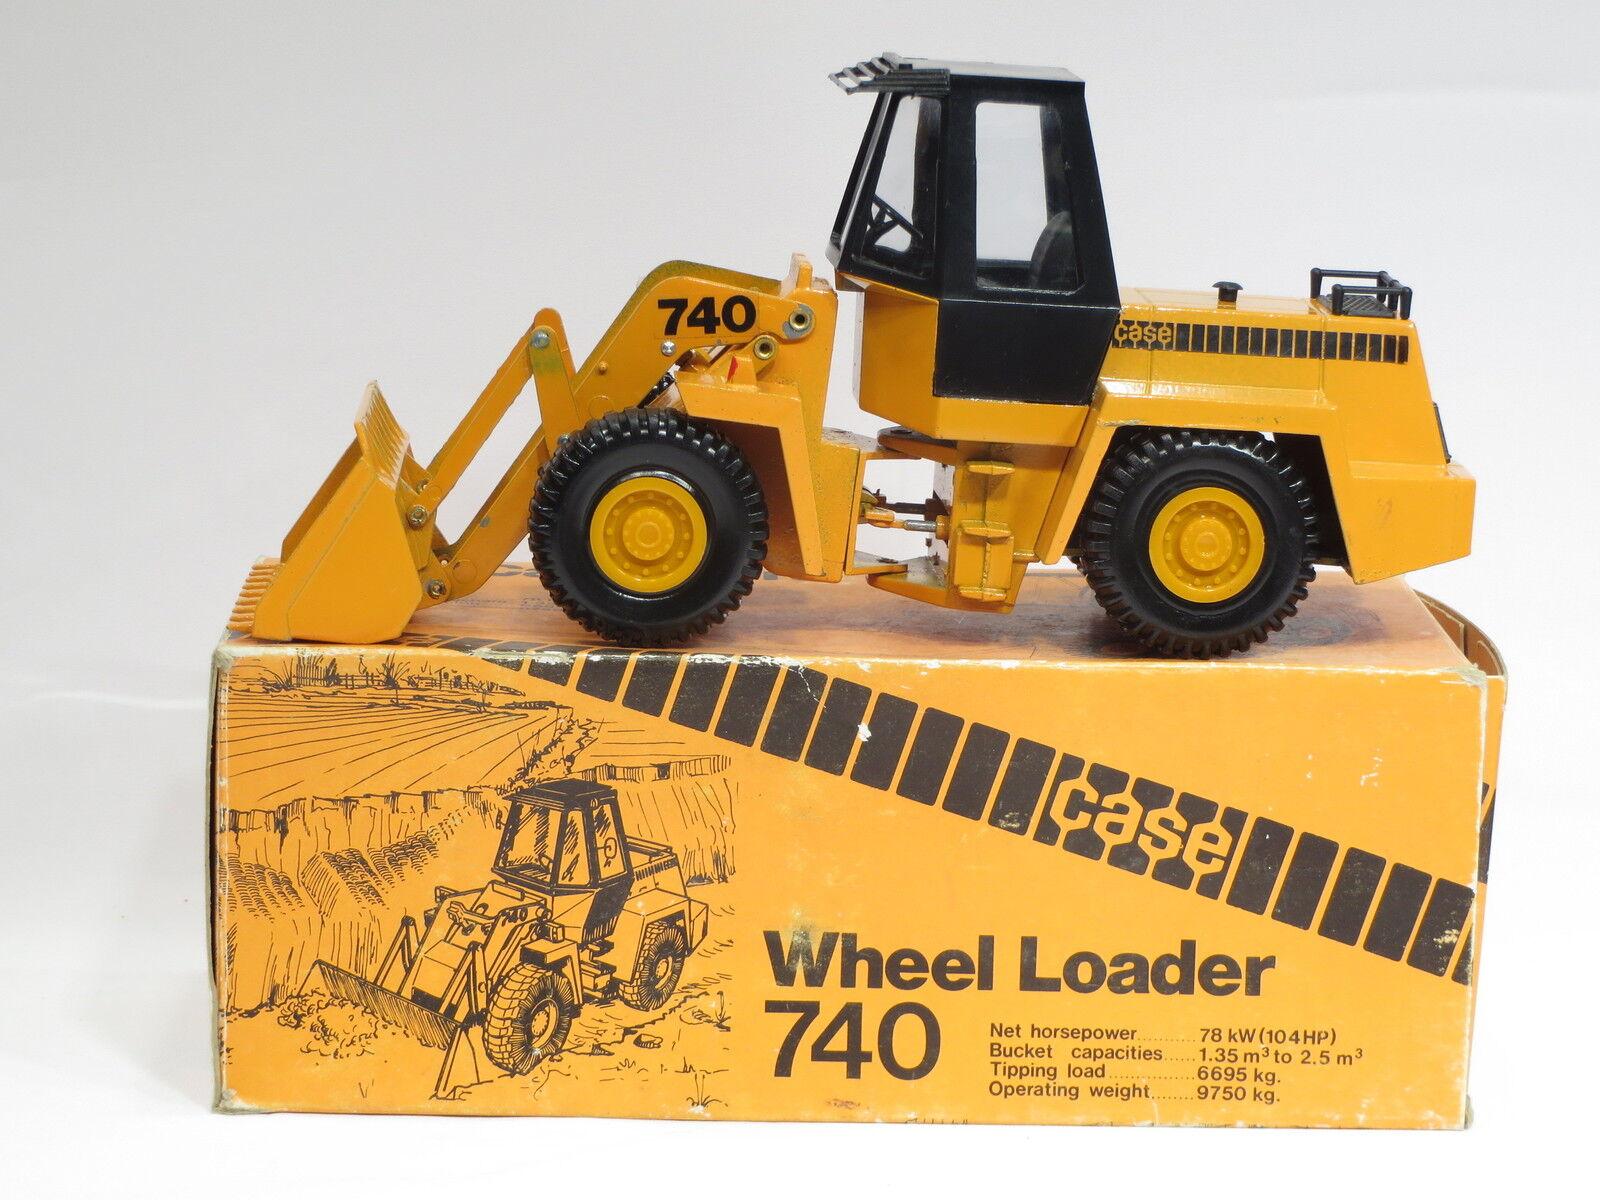 Case 740 Wheel Loader - 1 35 - - - Nacoral of Spain - N.MIB - RARE 3b105c